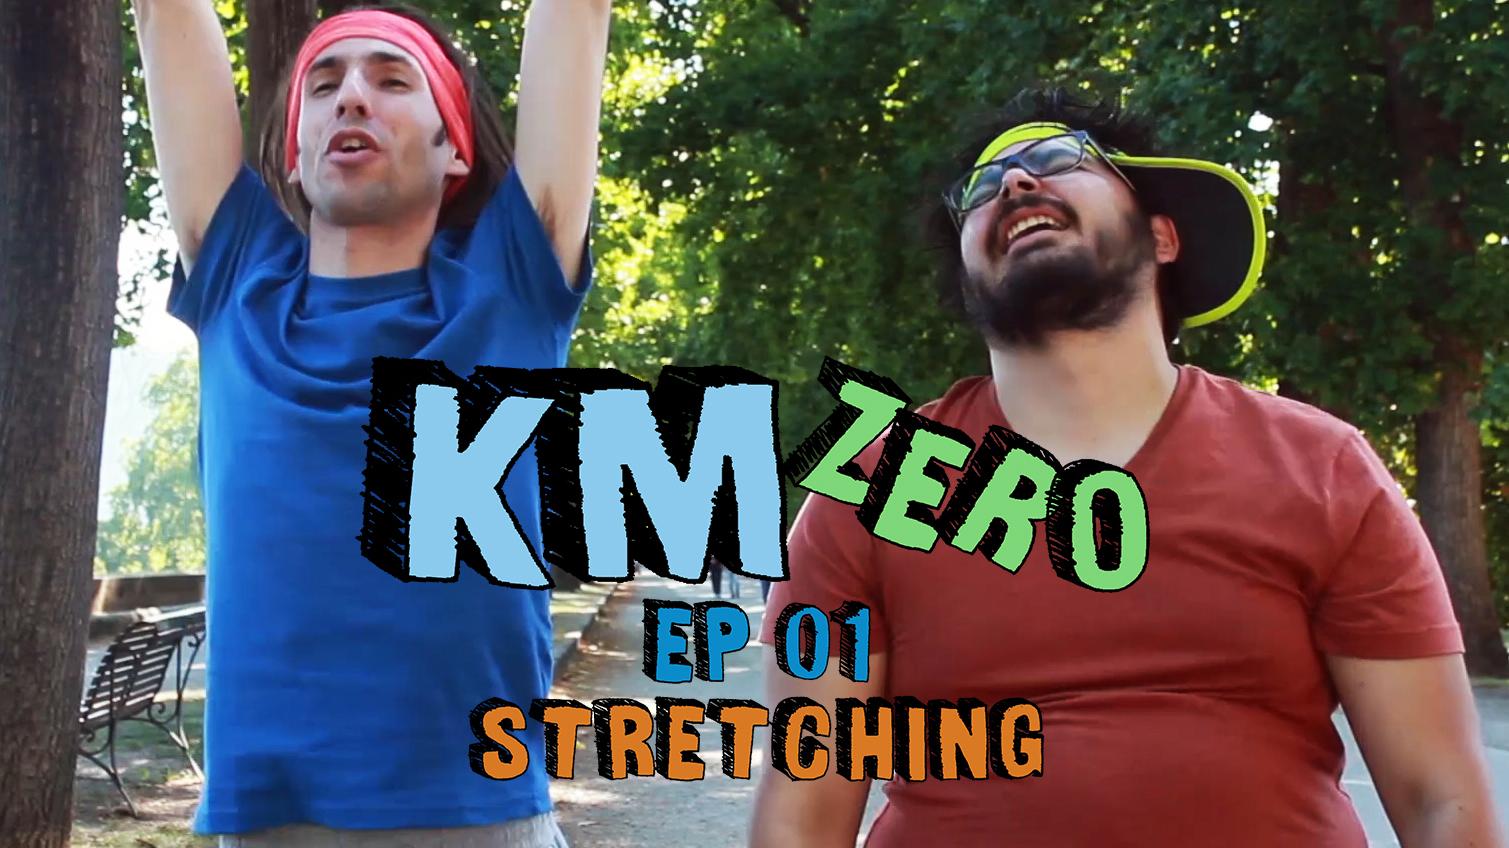 KmZero-E-01-Ok Web Serie